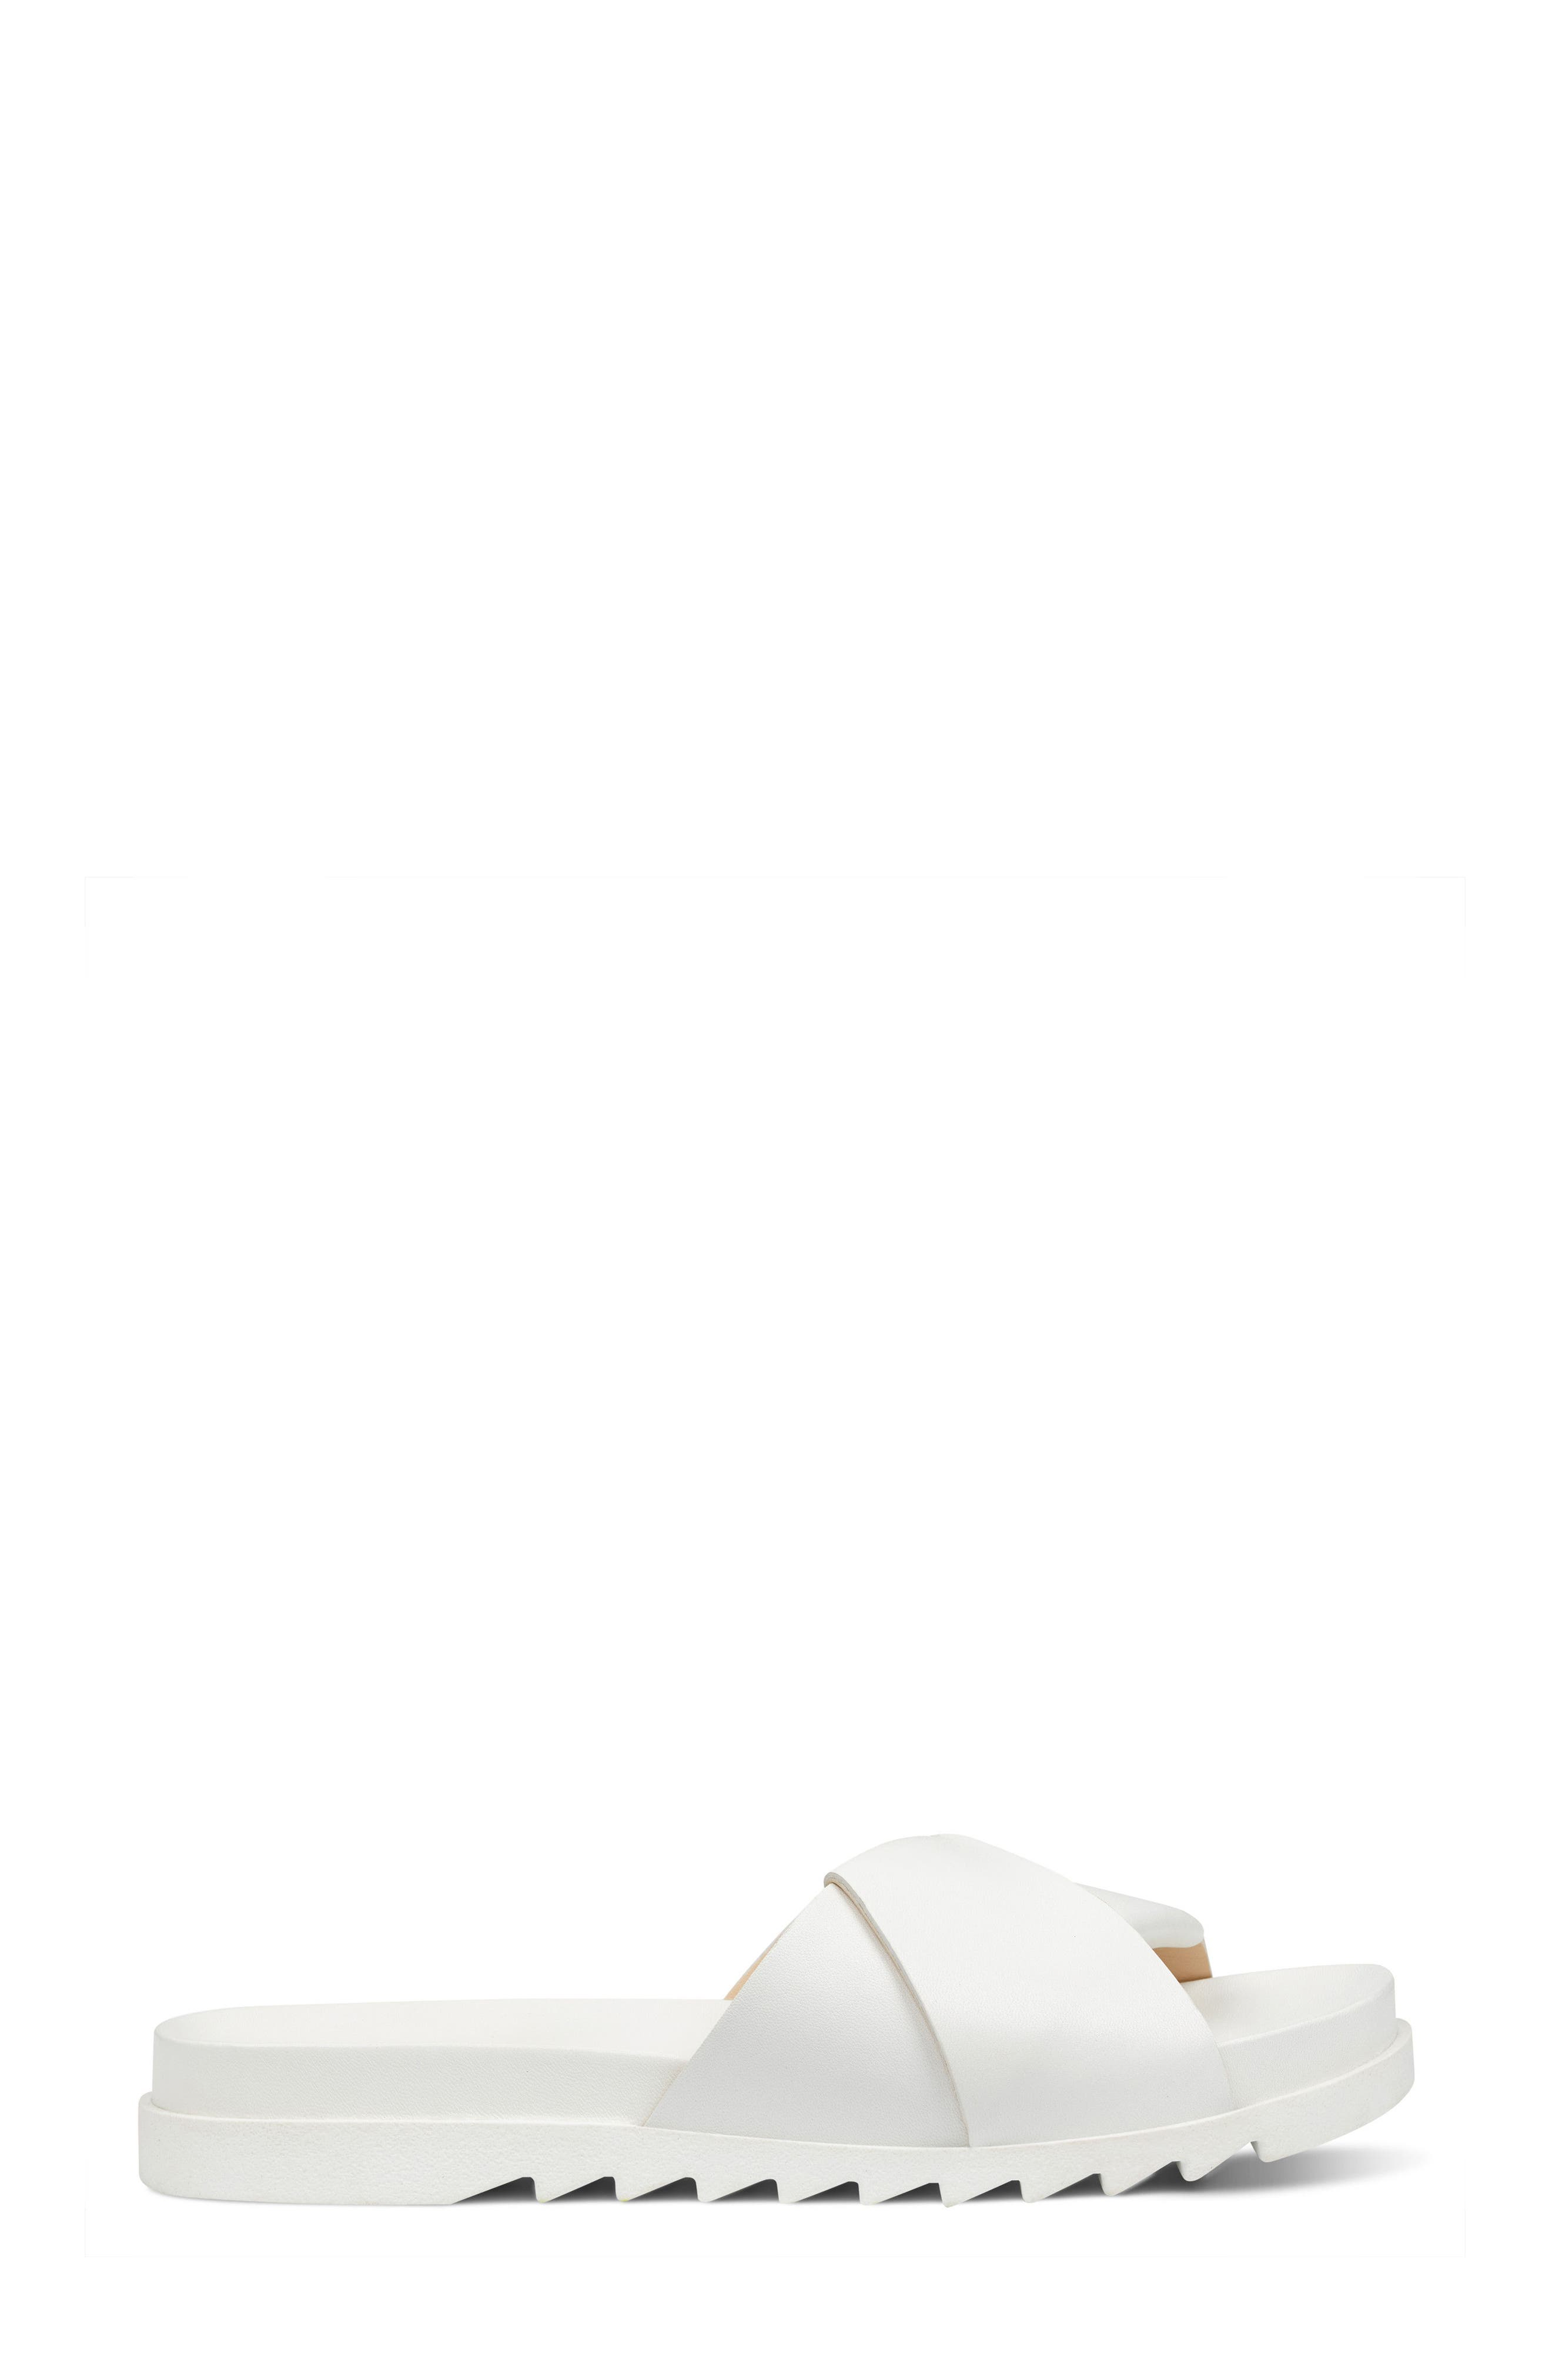 Furaish Slide Sandal,                             Alternate thumbnail 3, color,                             White Leather